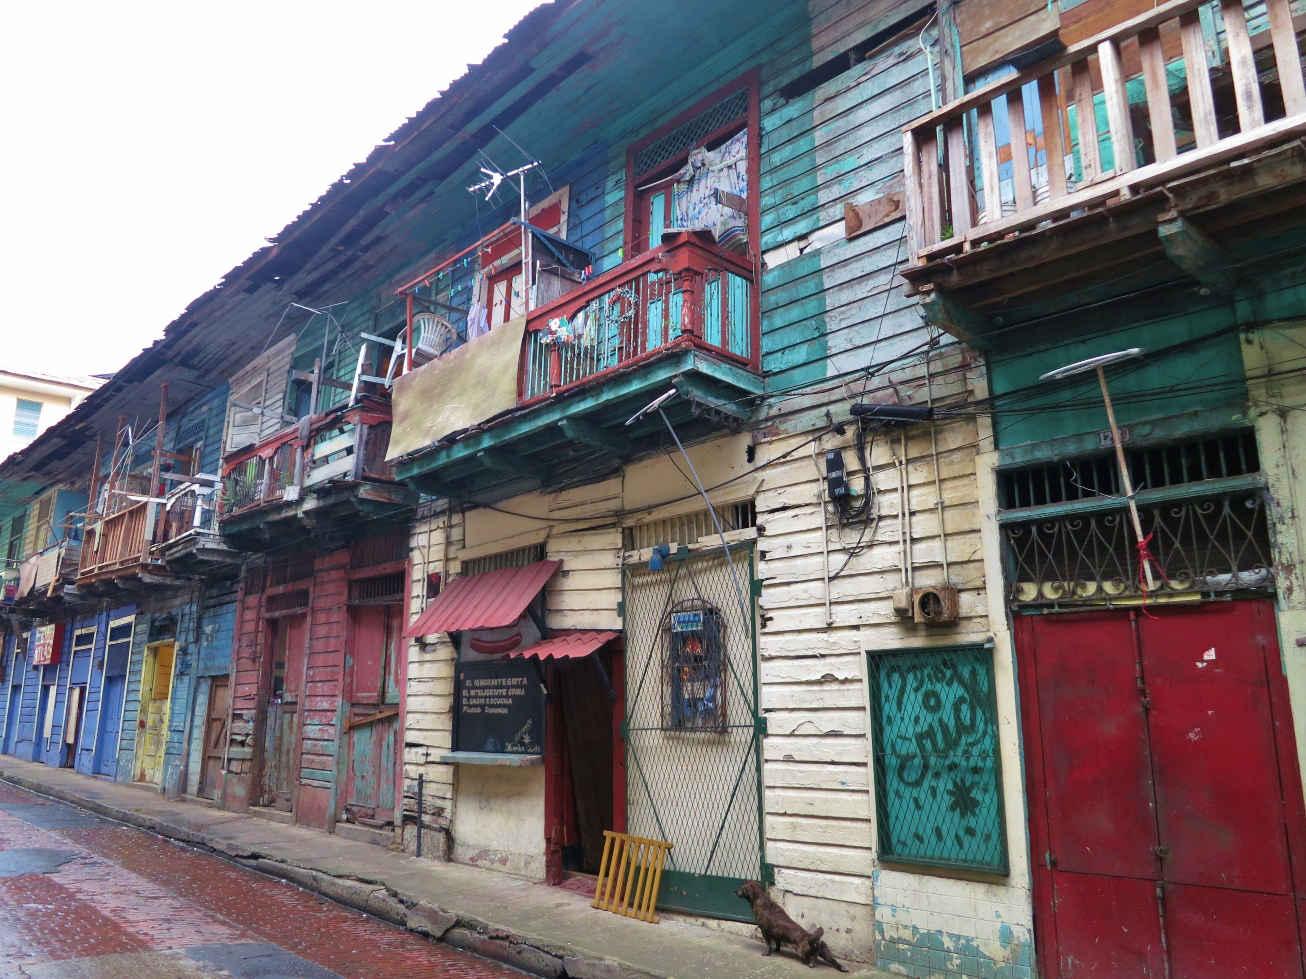 One of Casco Viejo's colorful street scenes